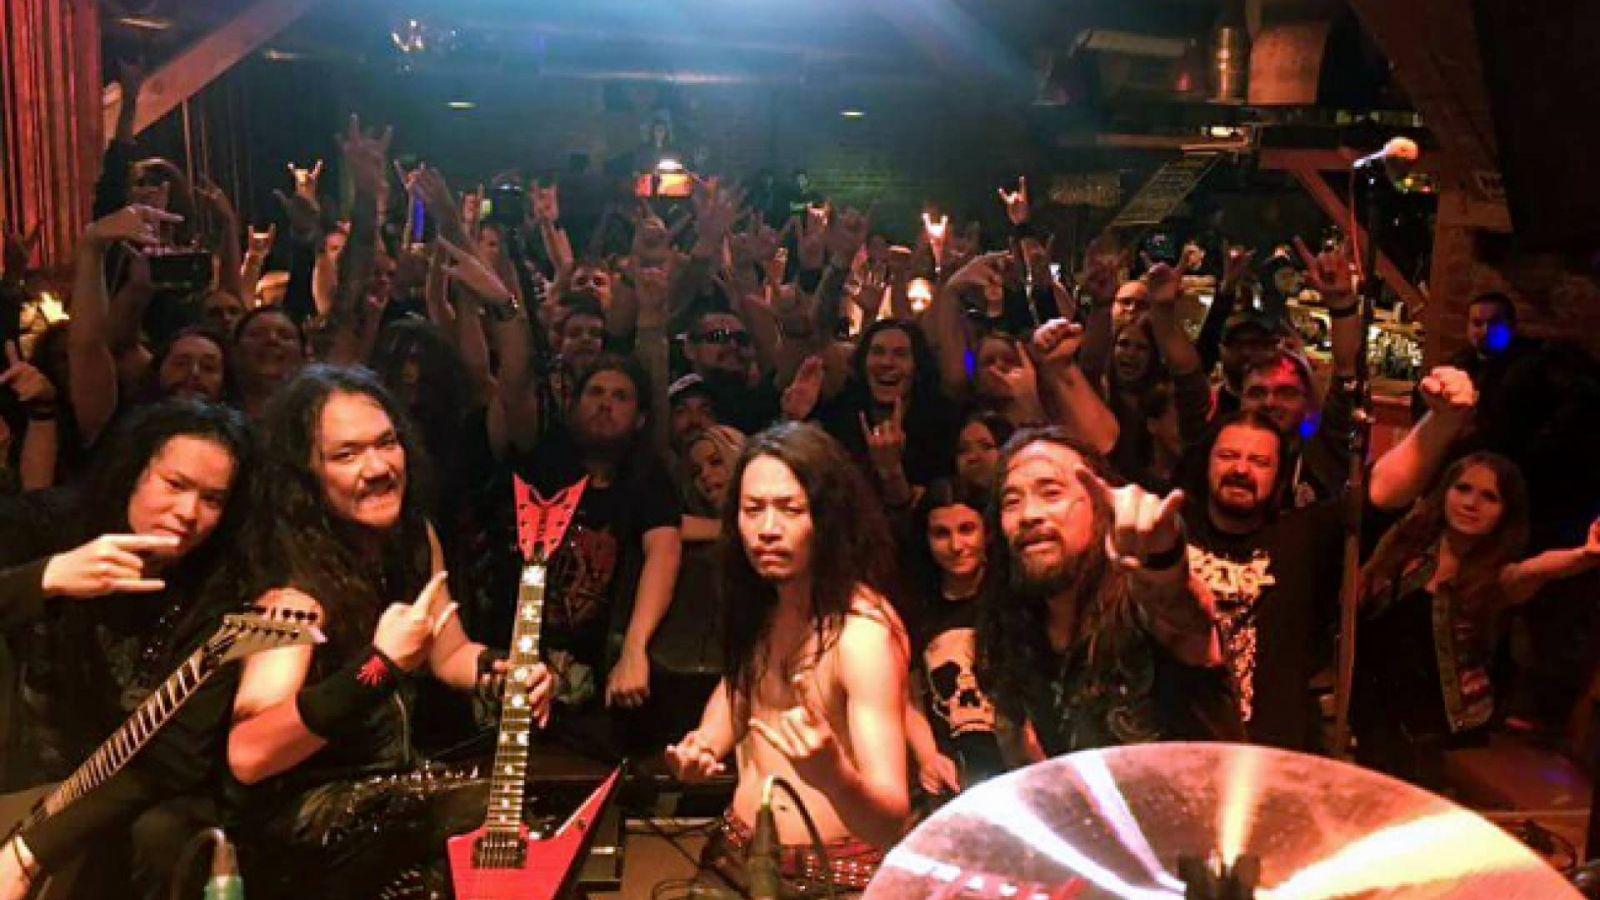 Концерт Survive в Санкт-Петербурге © SURVIVE Official Facebook Page